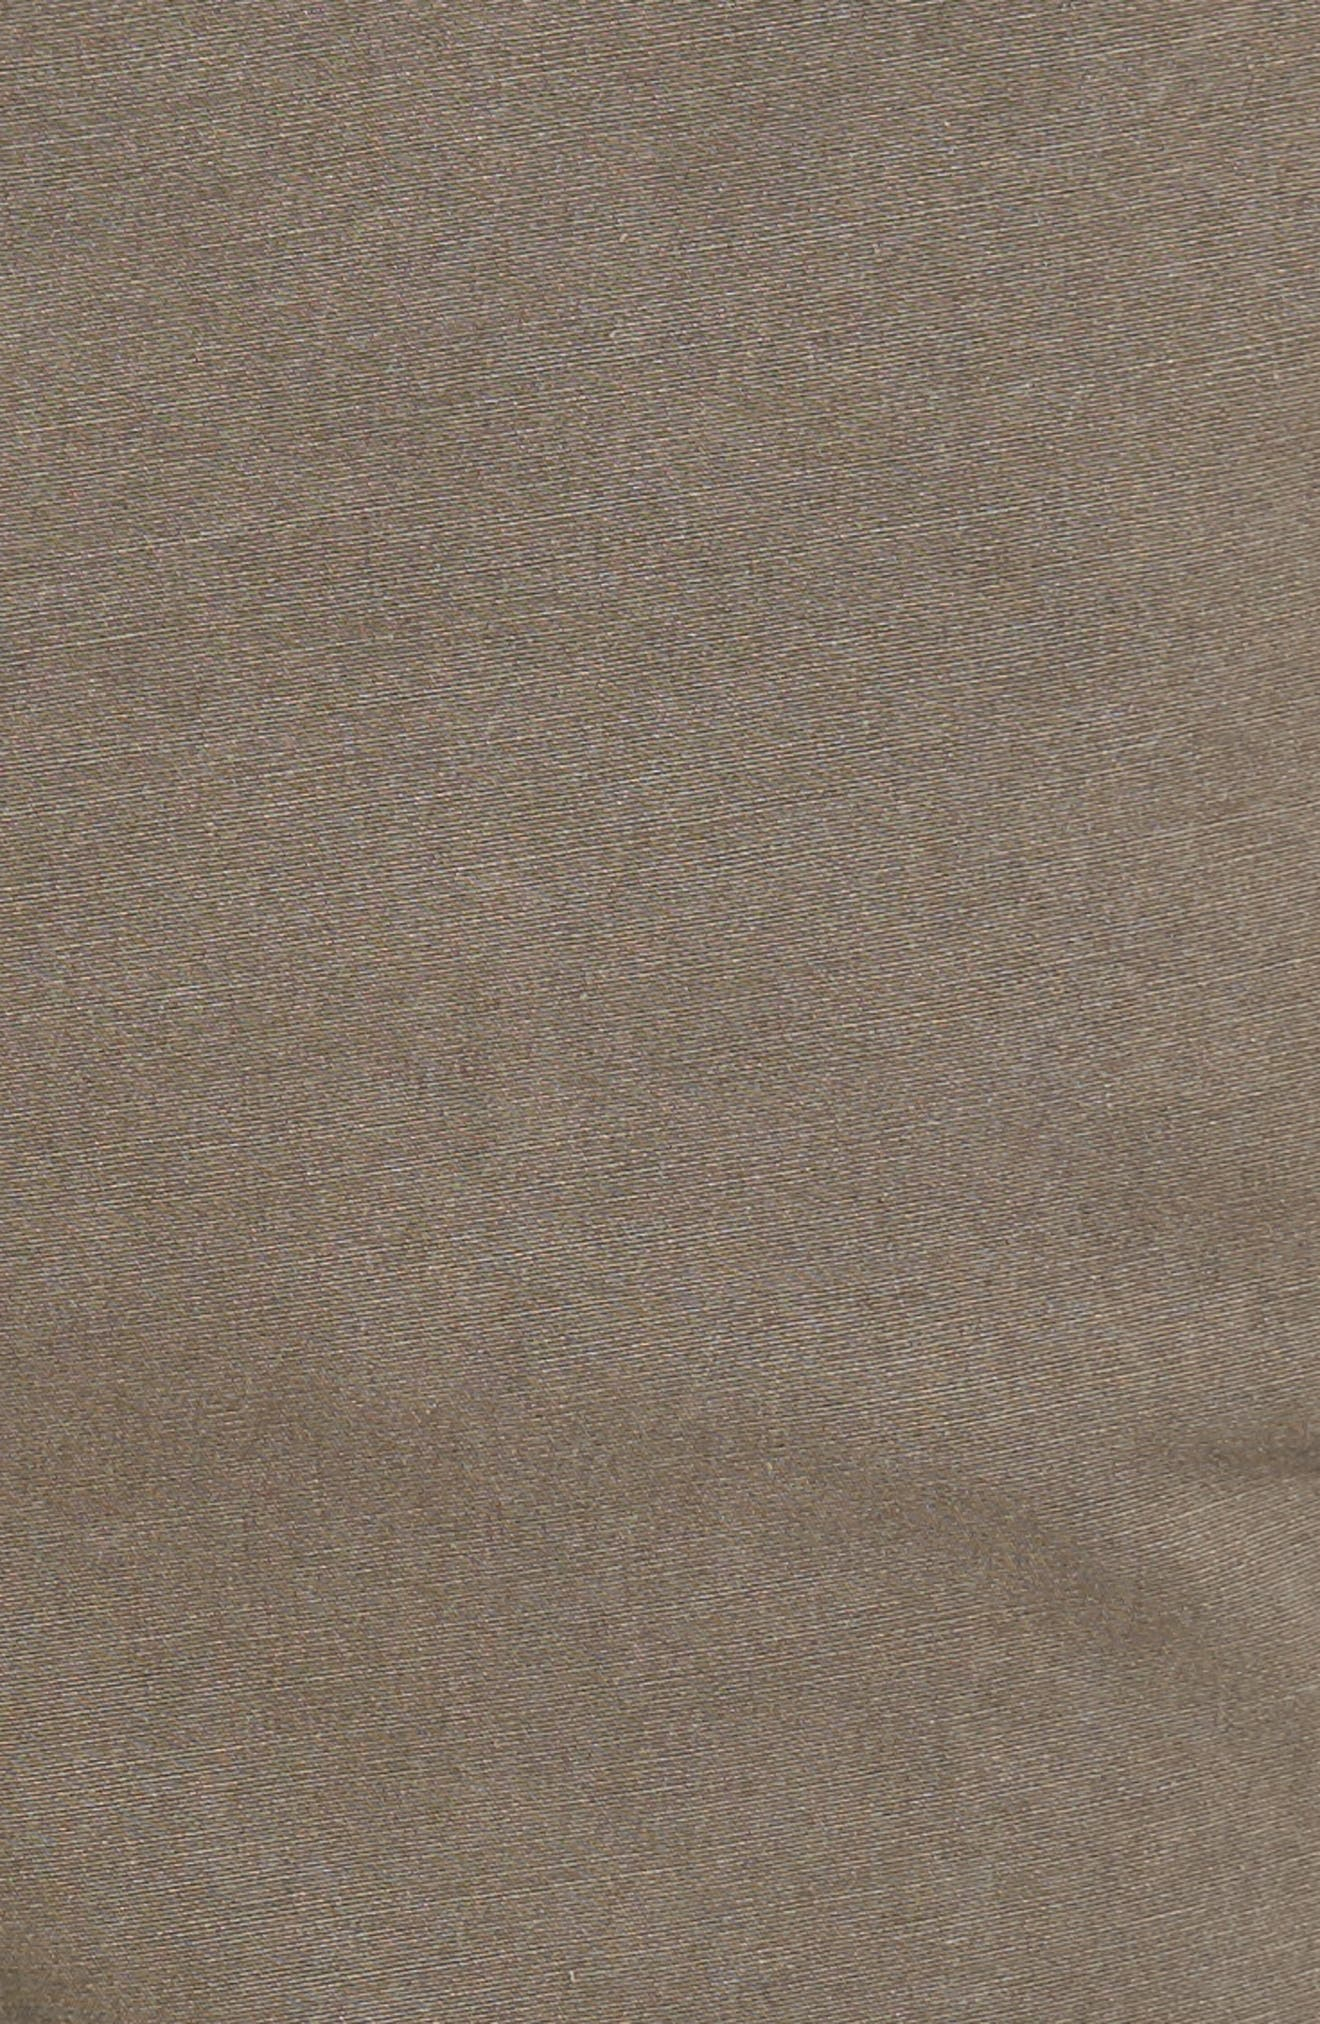 Slim Stretch Poplin Drawcord Pants,                             Alternate thumbnail 19, color,